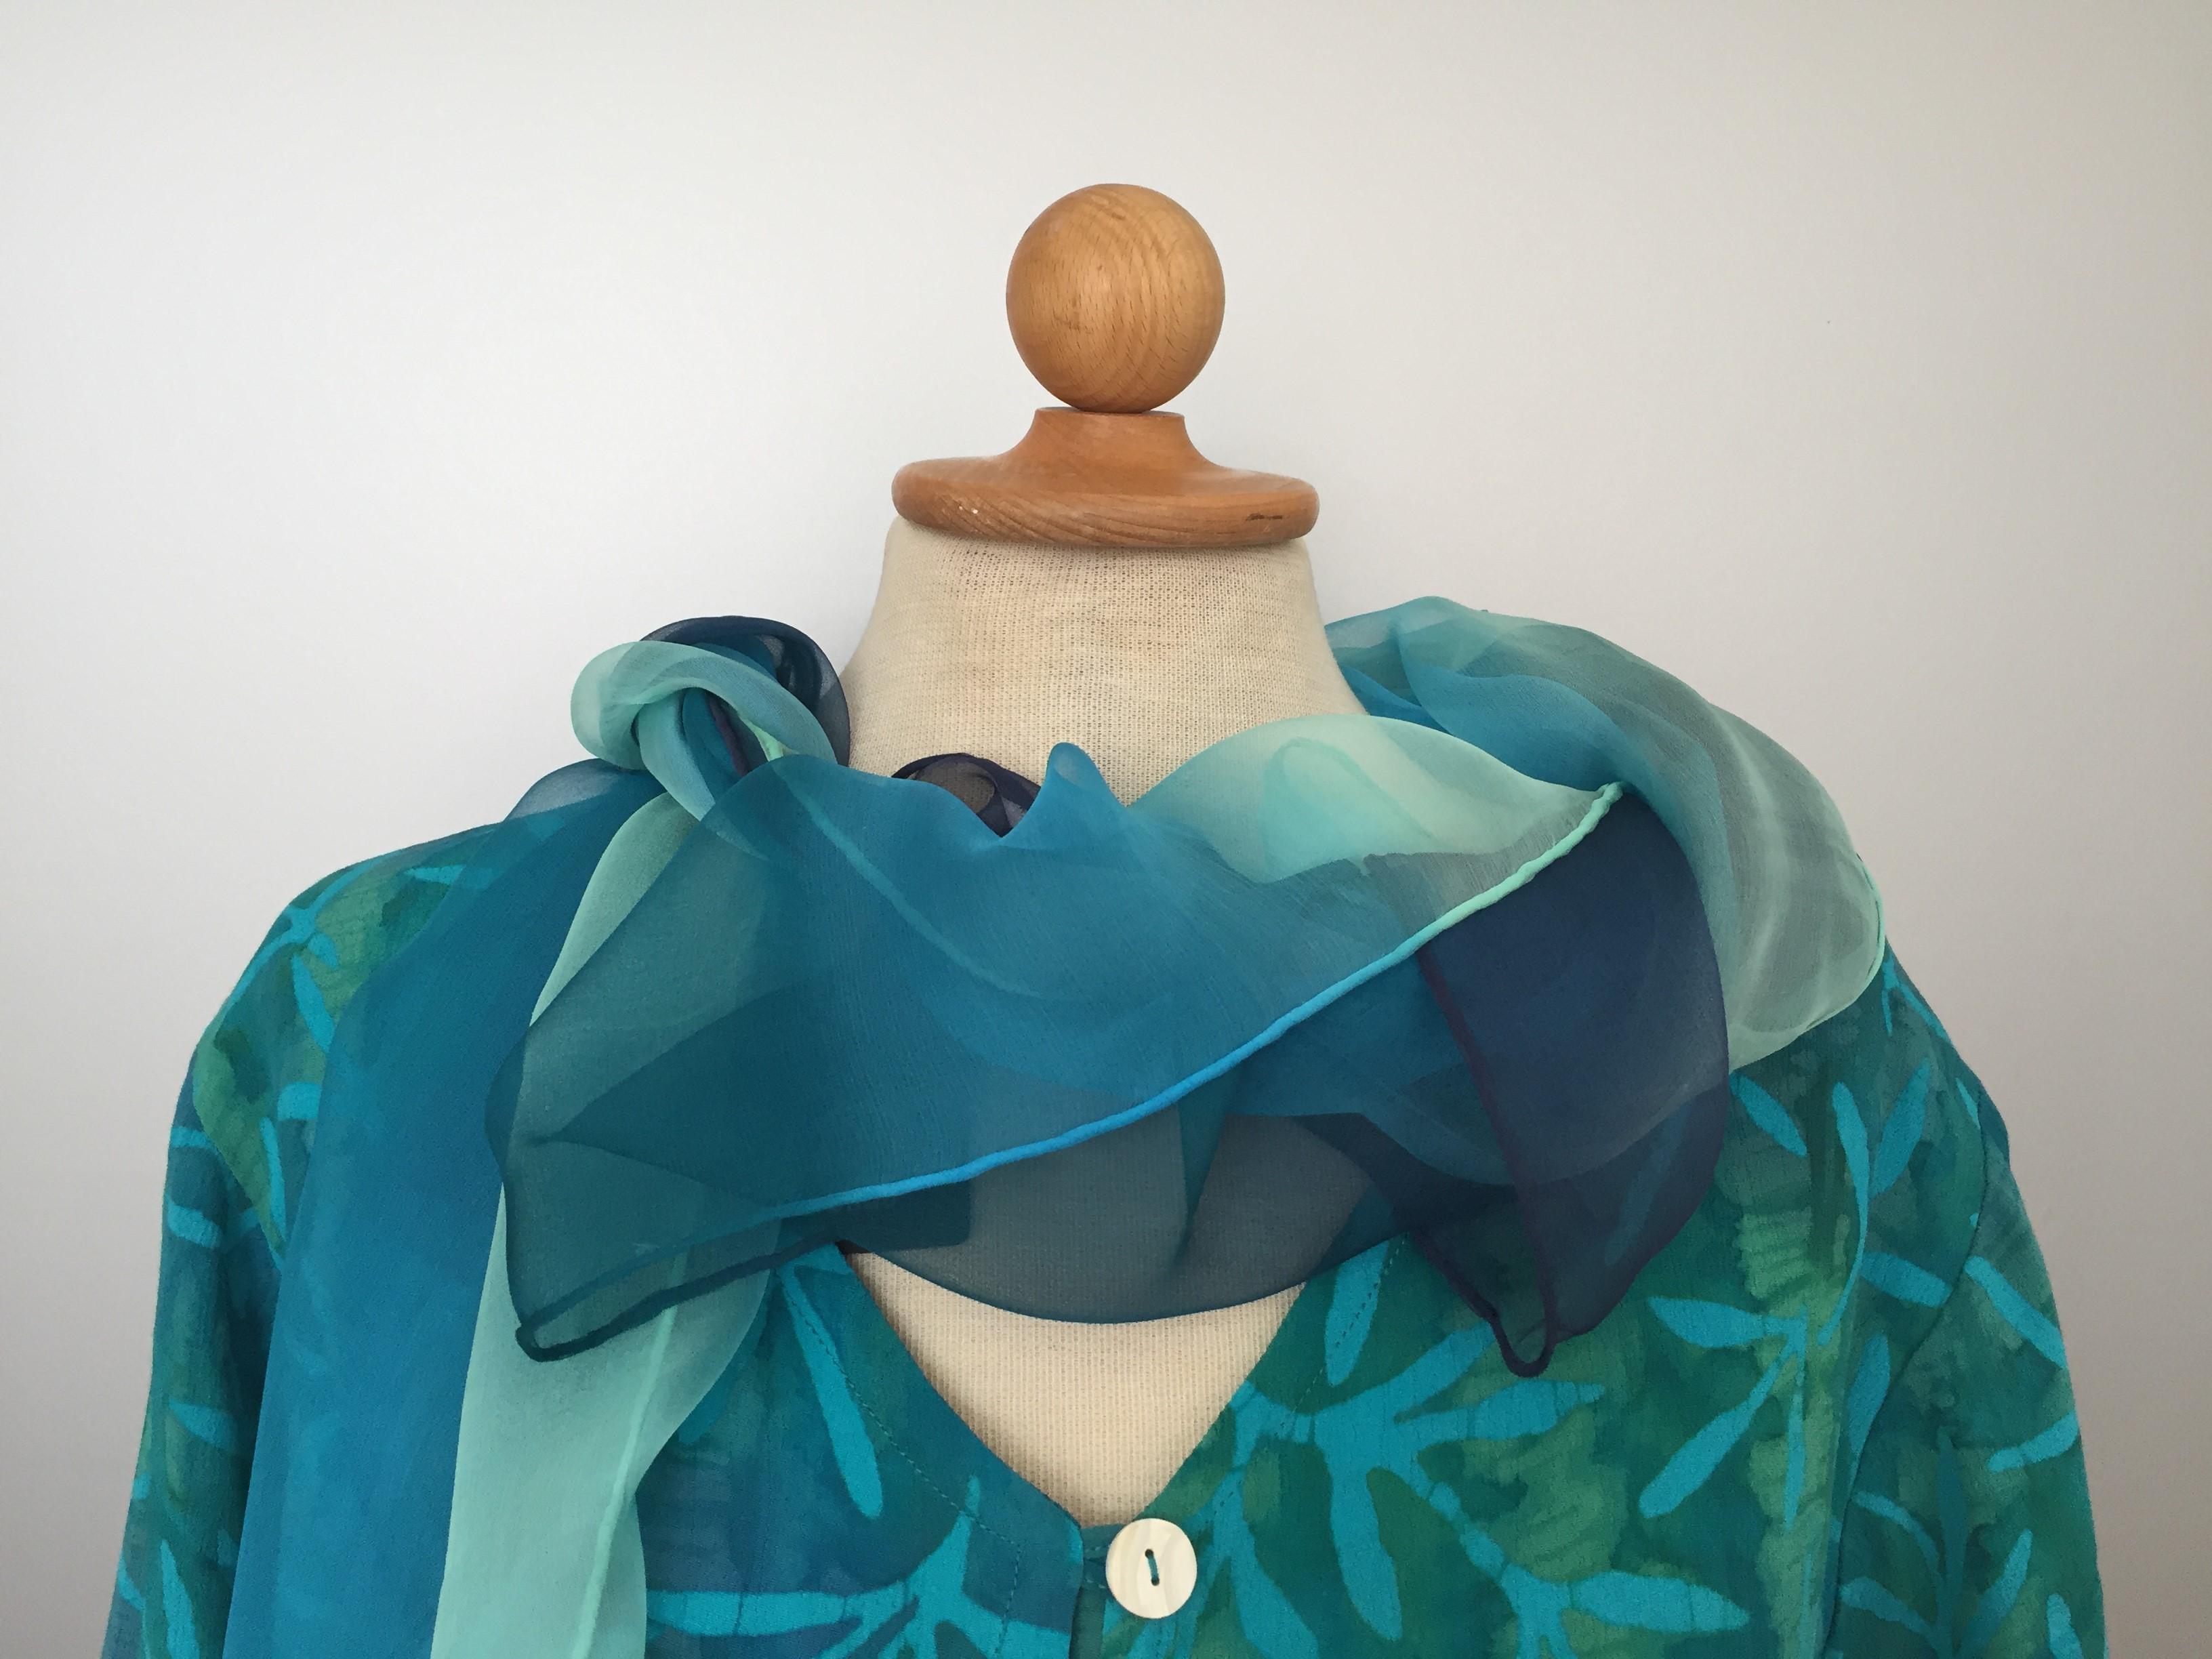 39f1fbf83e69 Batik bluse130 - Padi turkis i lækkert crepestof med perlemorsknapper